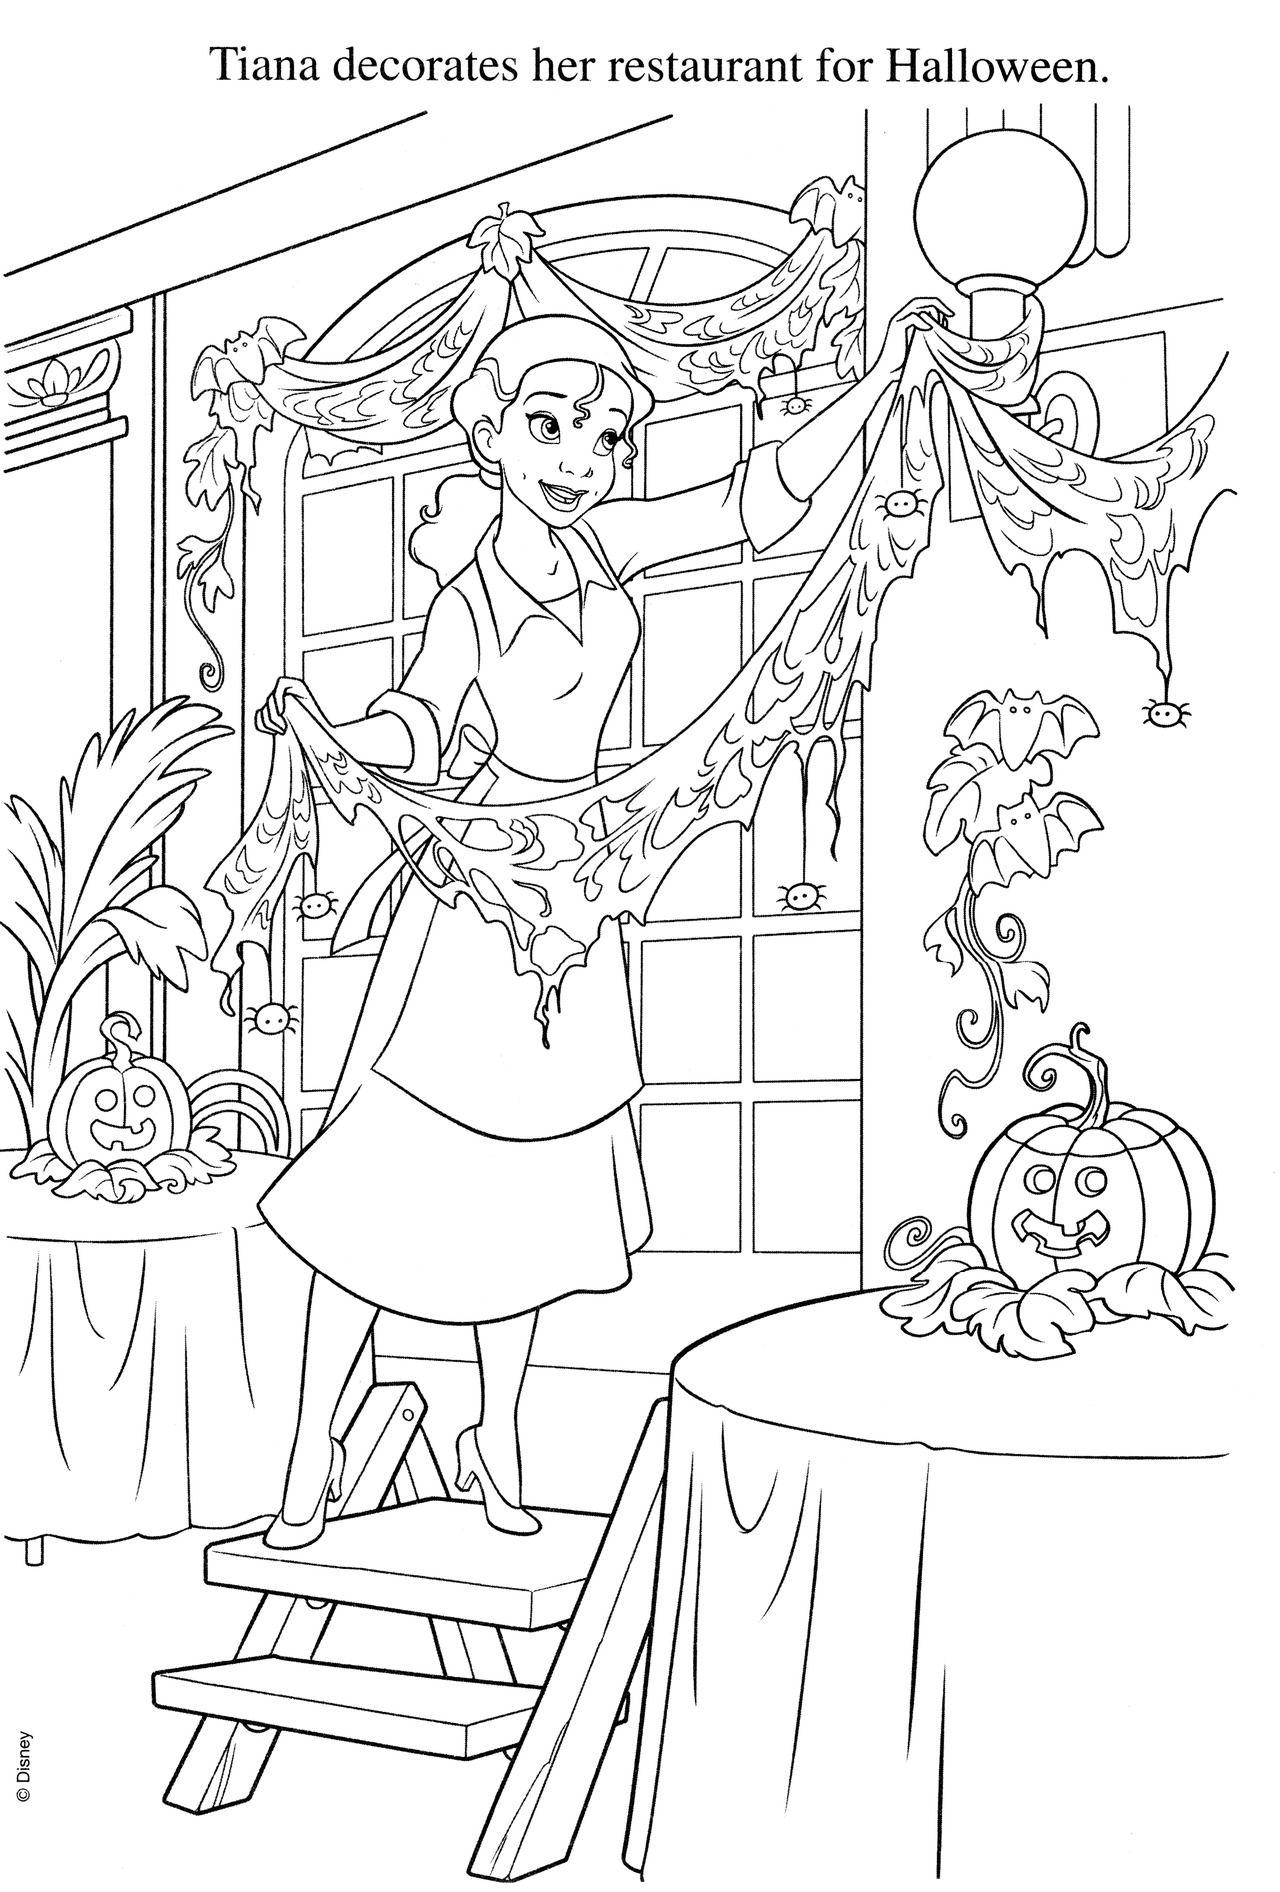 Disney Coloring Pages Disney coloring pages, Disney